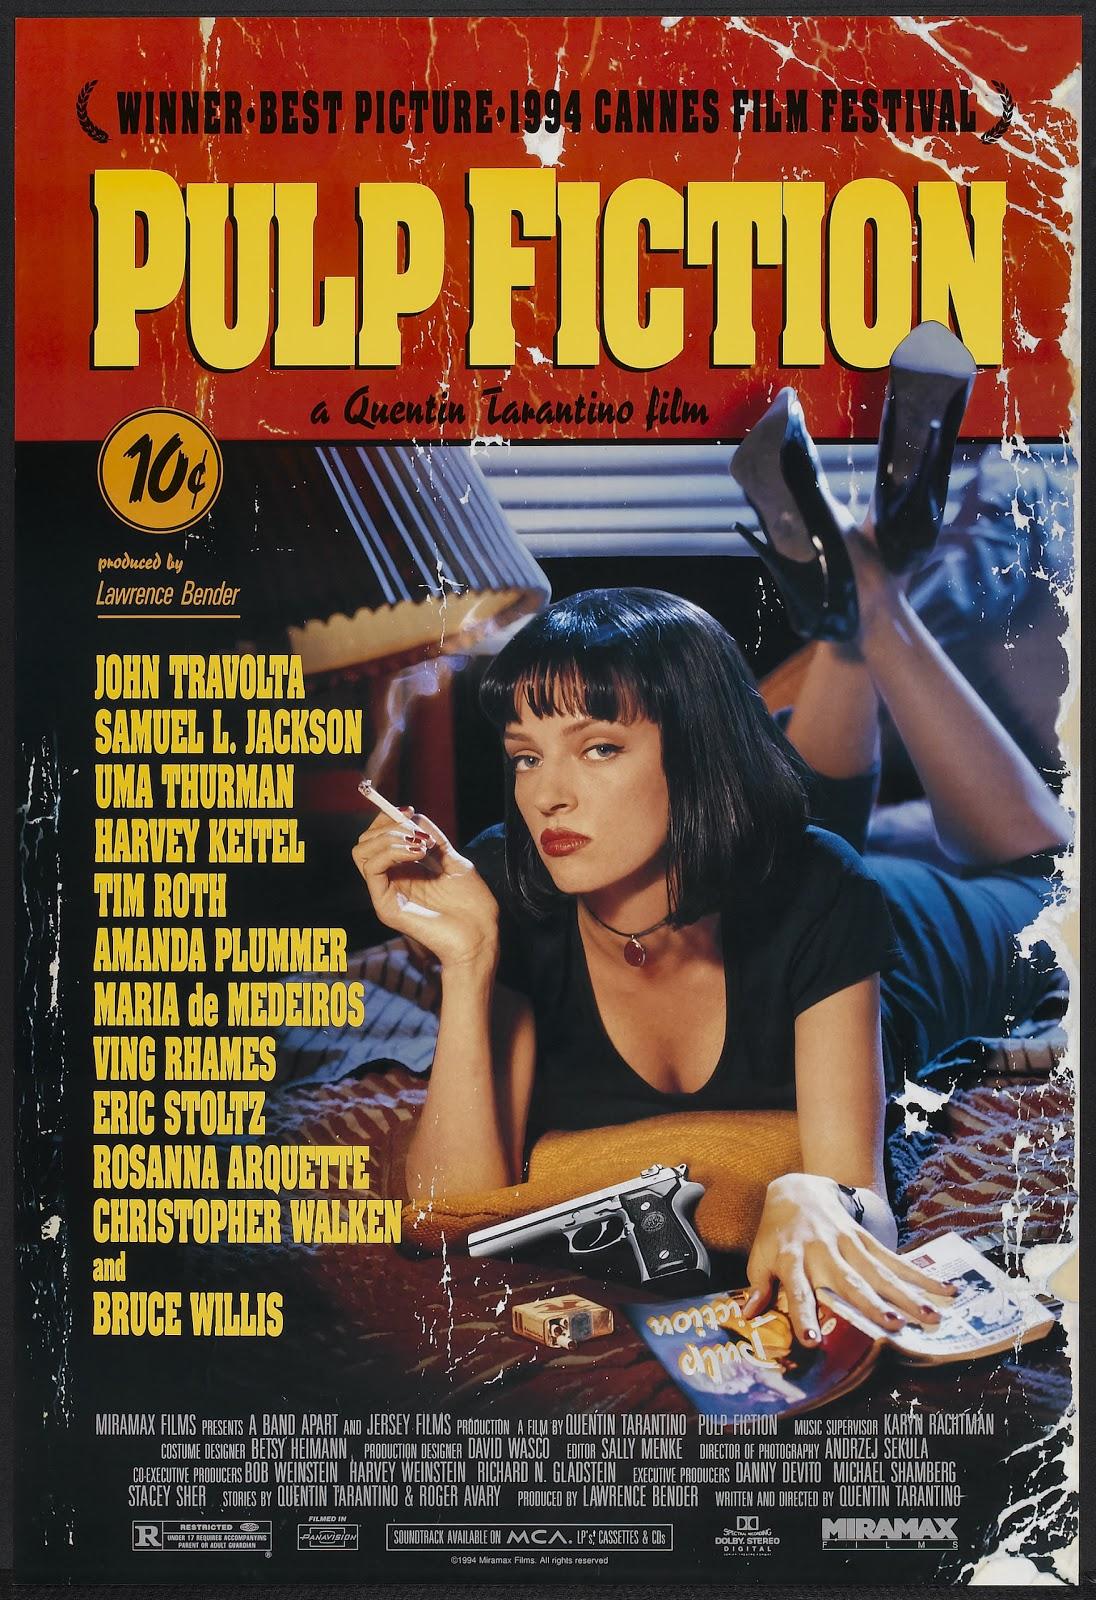 Favorite movie poster